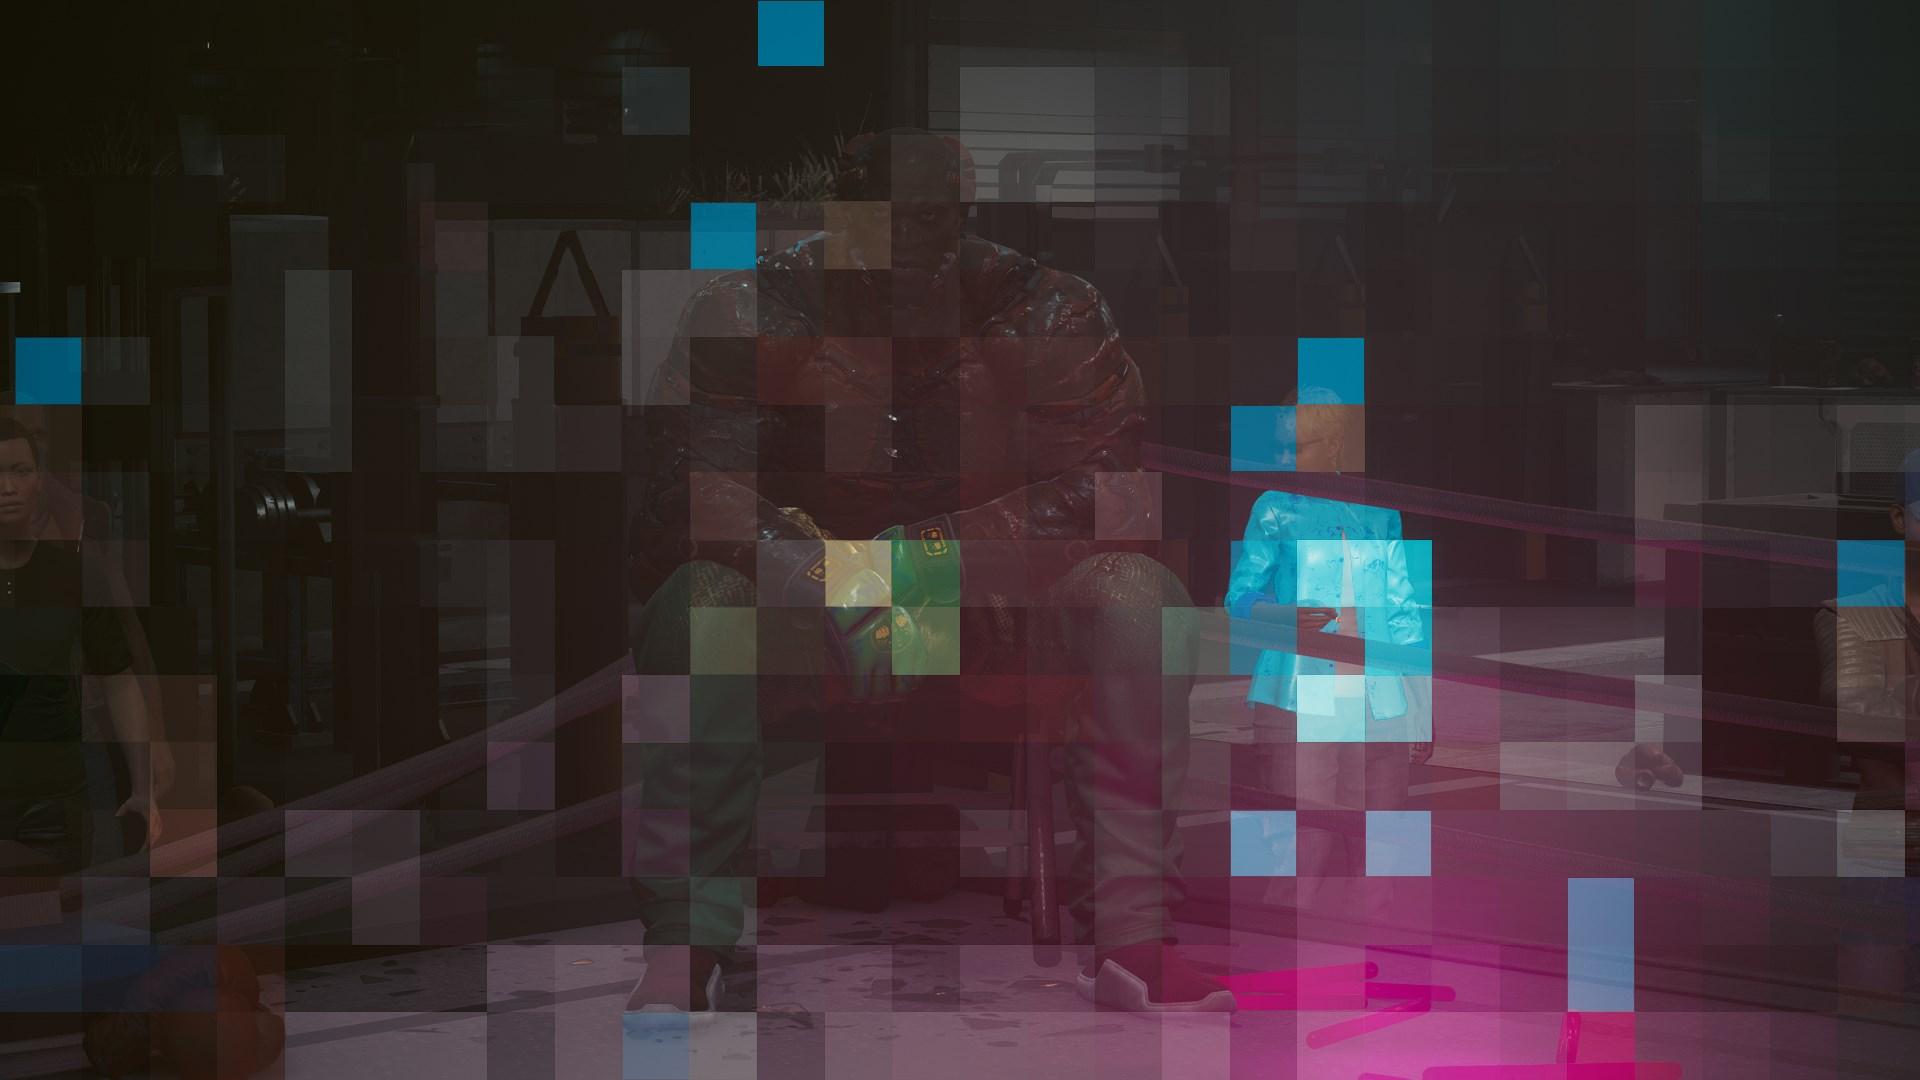 Cyberpunk2077_7b40QjUJiq.jpg